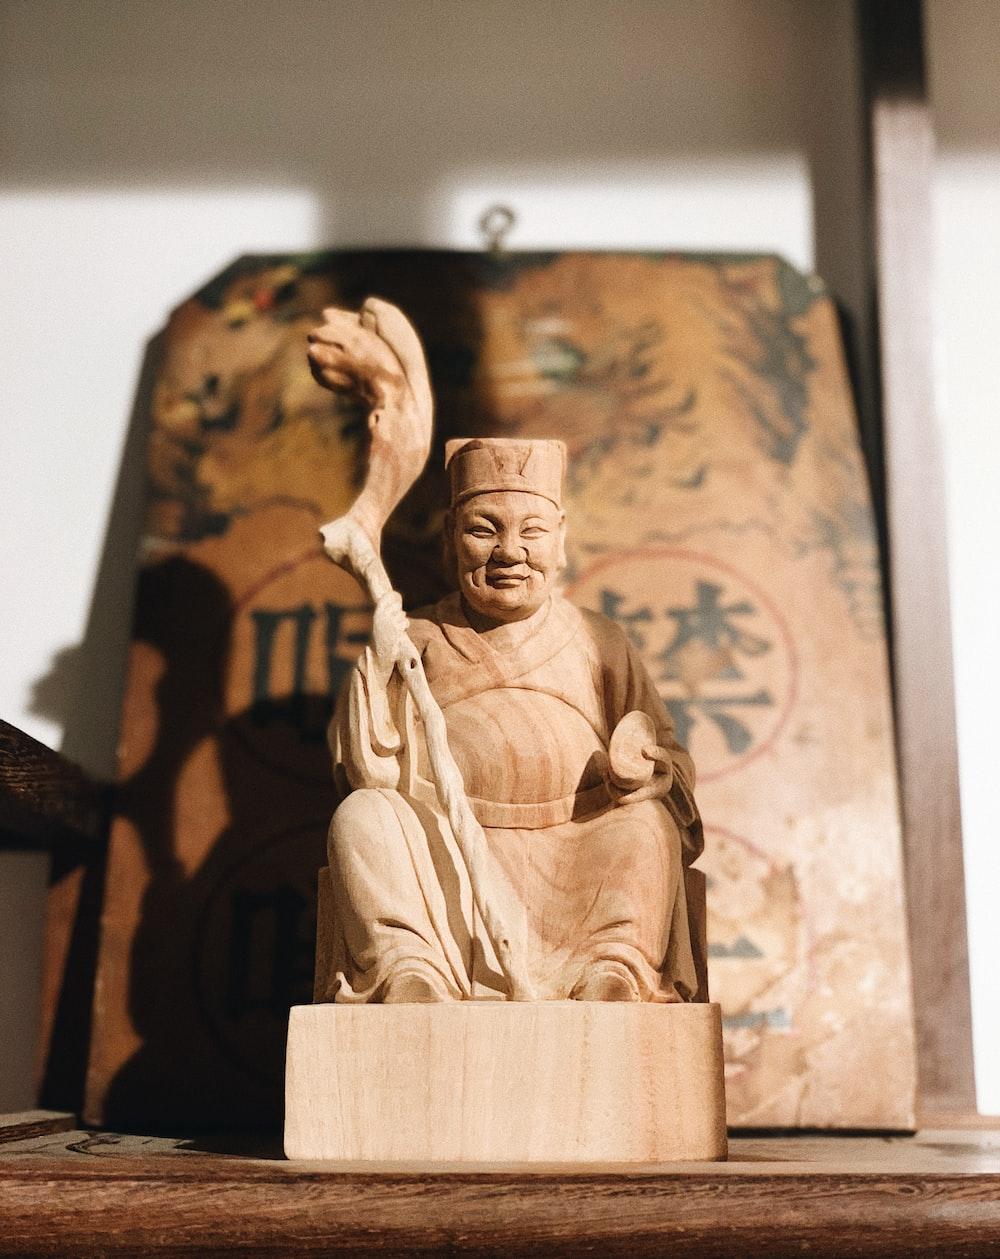 man in robe statue photo